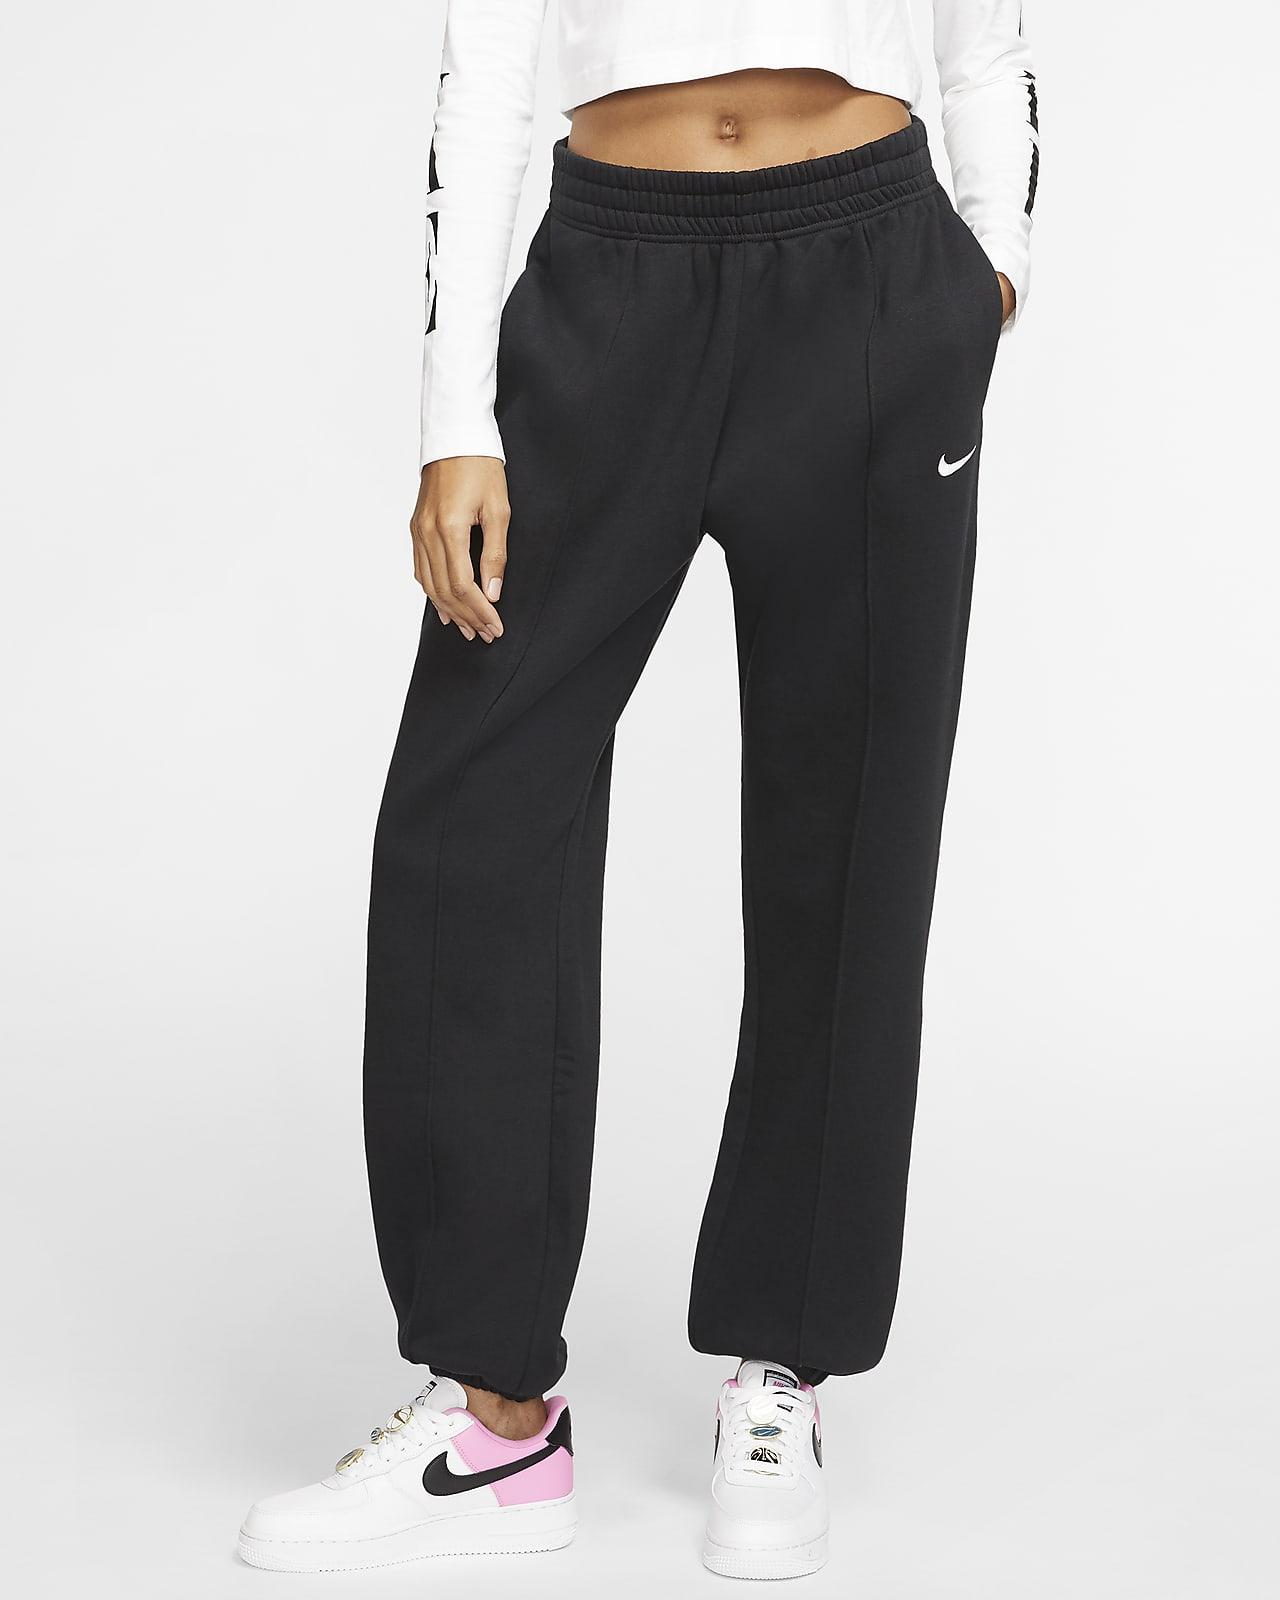 Женские флисовые брюки Nike Sportswear Essential Collection